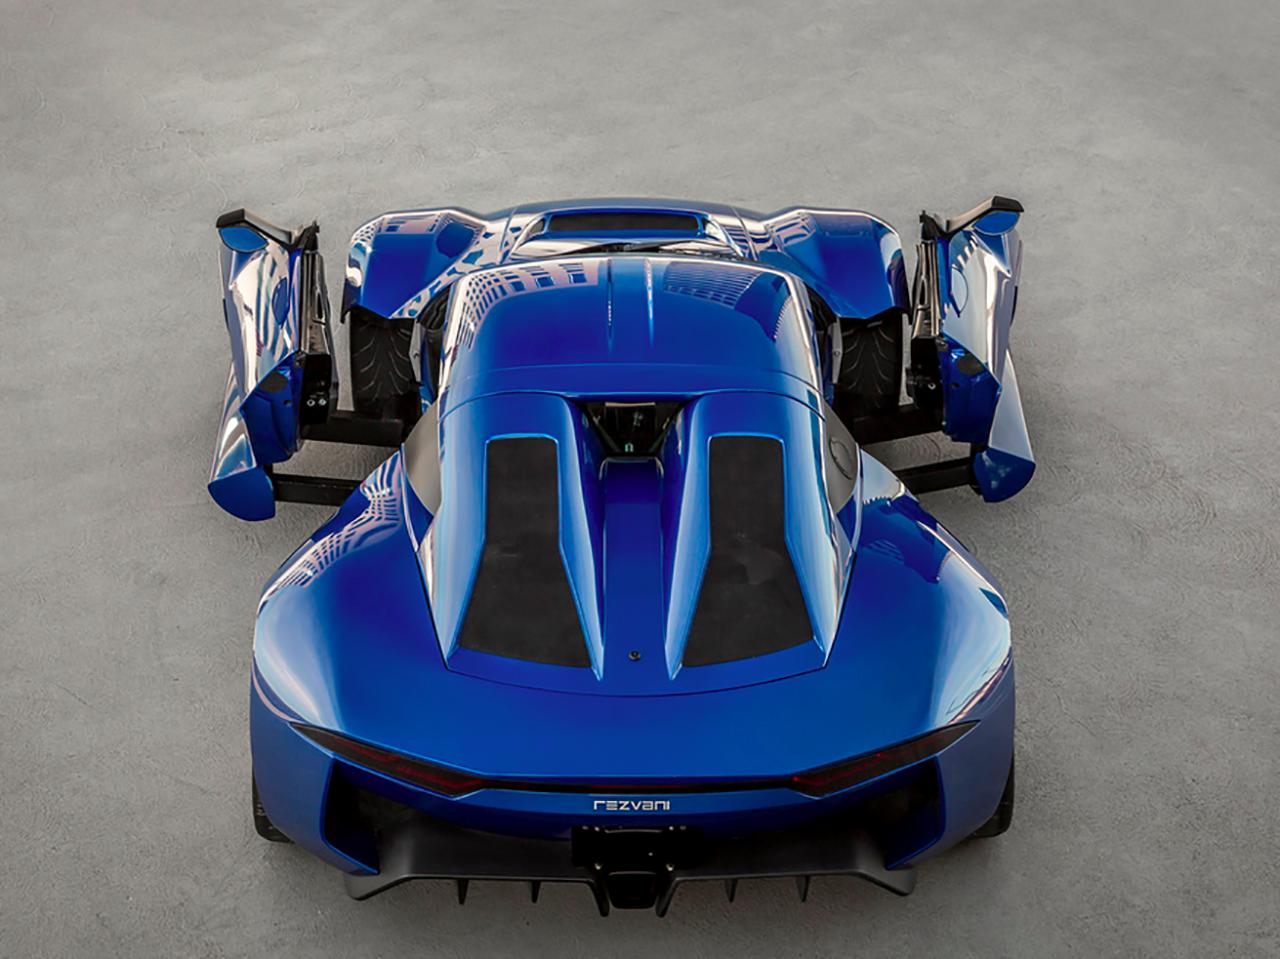 Meet The 500 Hp Rezvani Beast Alpha And Its Crazy Sliding Doors Super Cars Beast Car Show